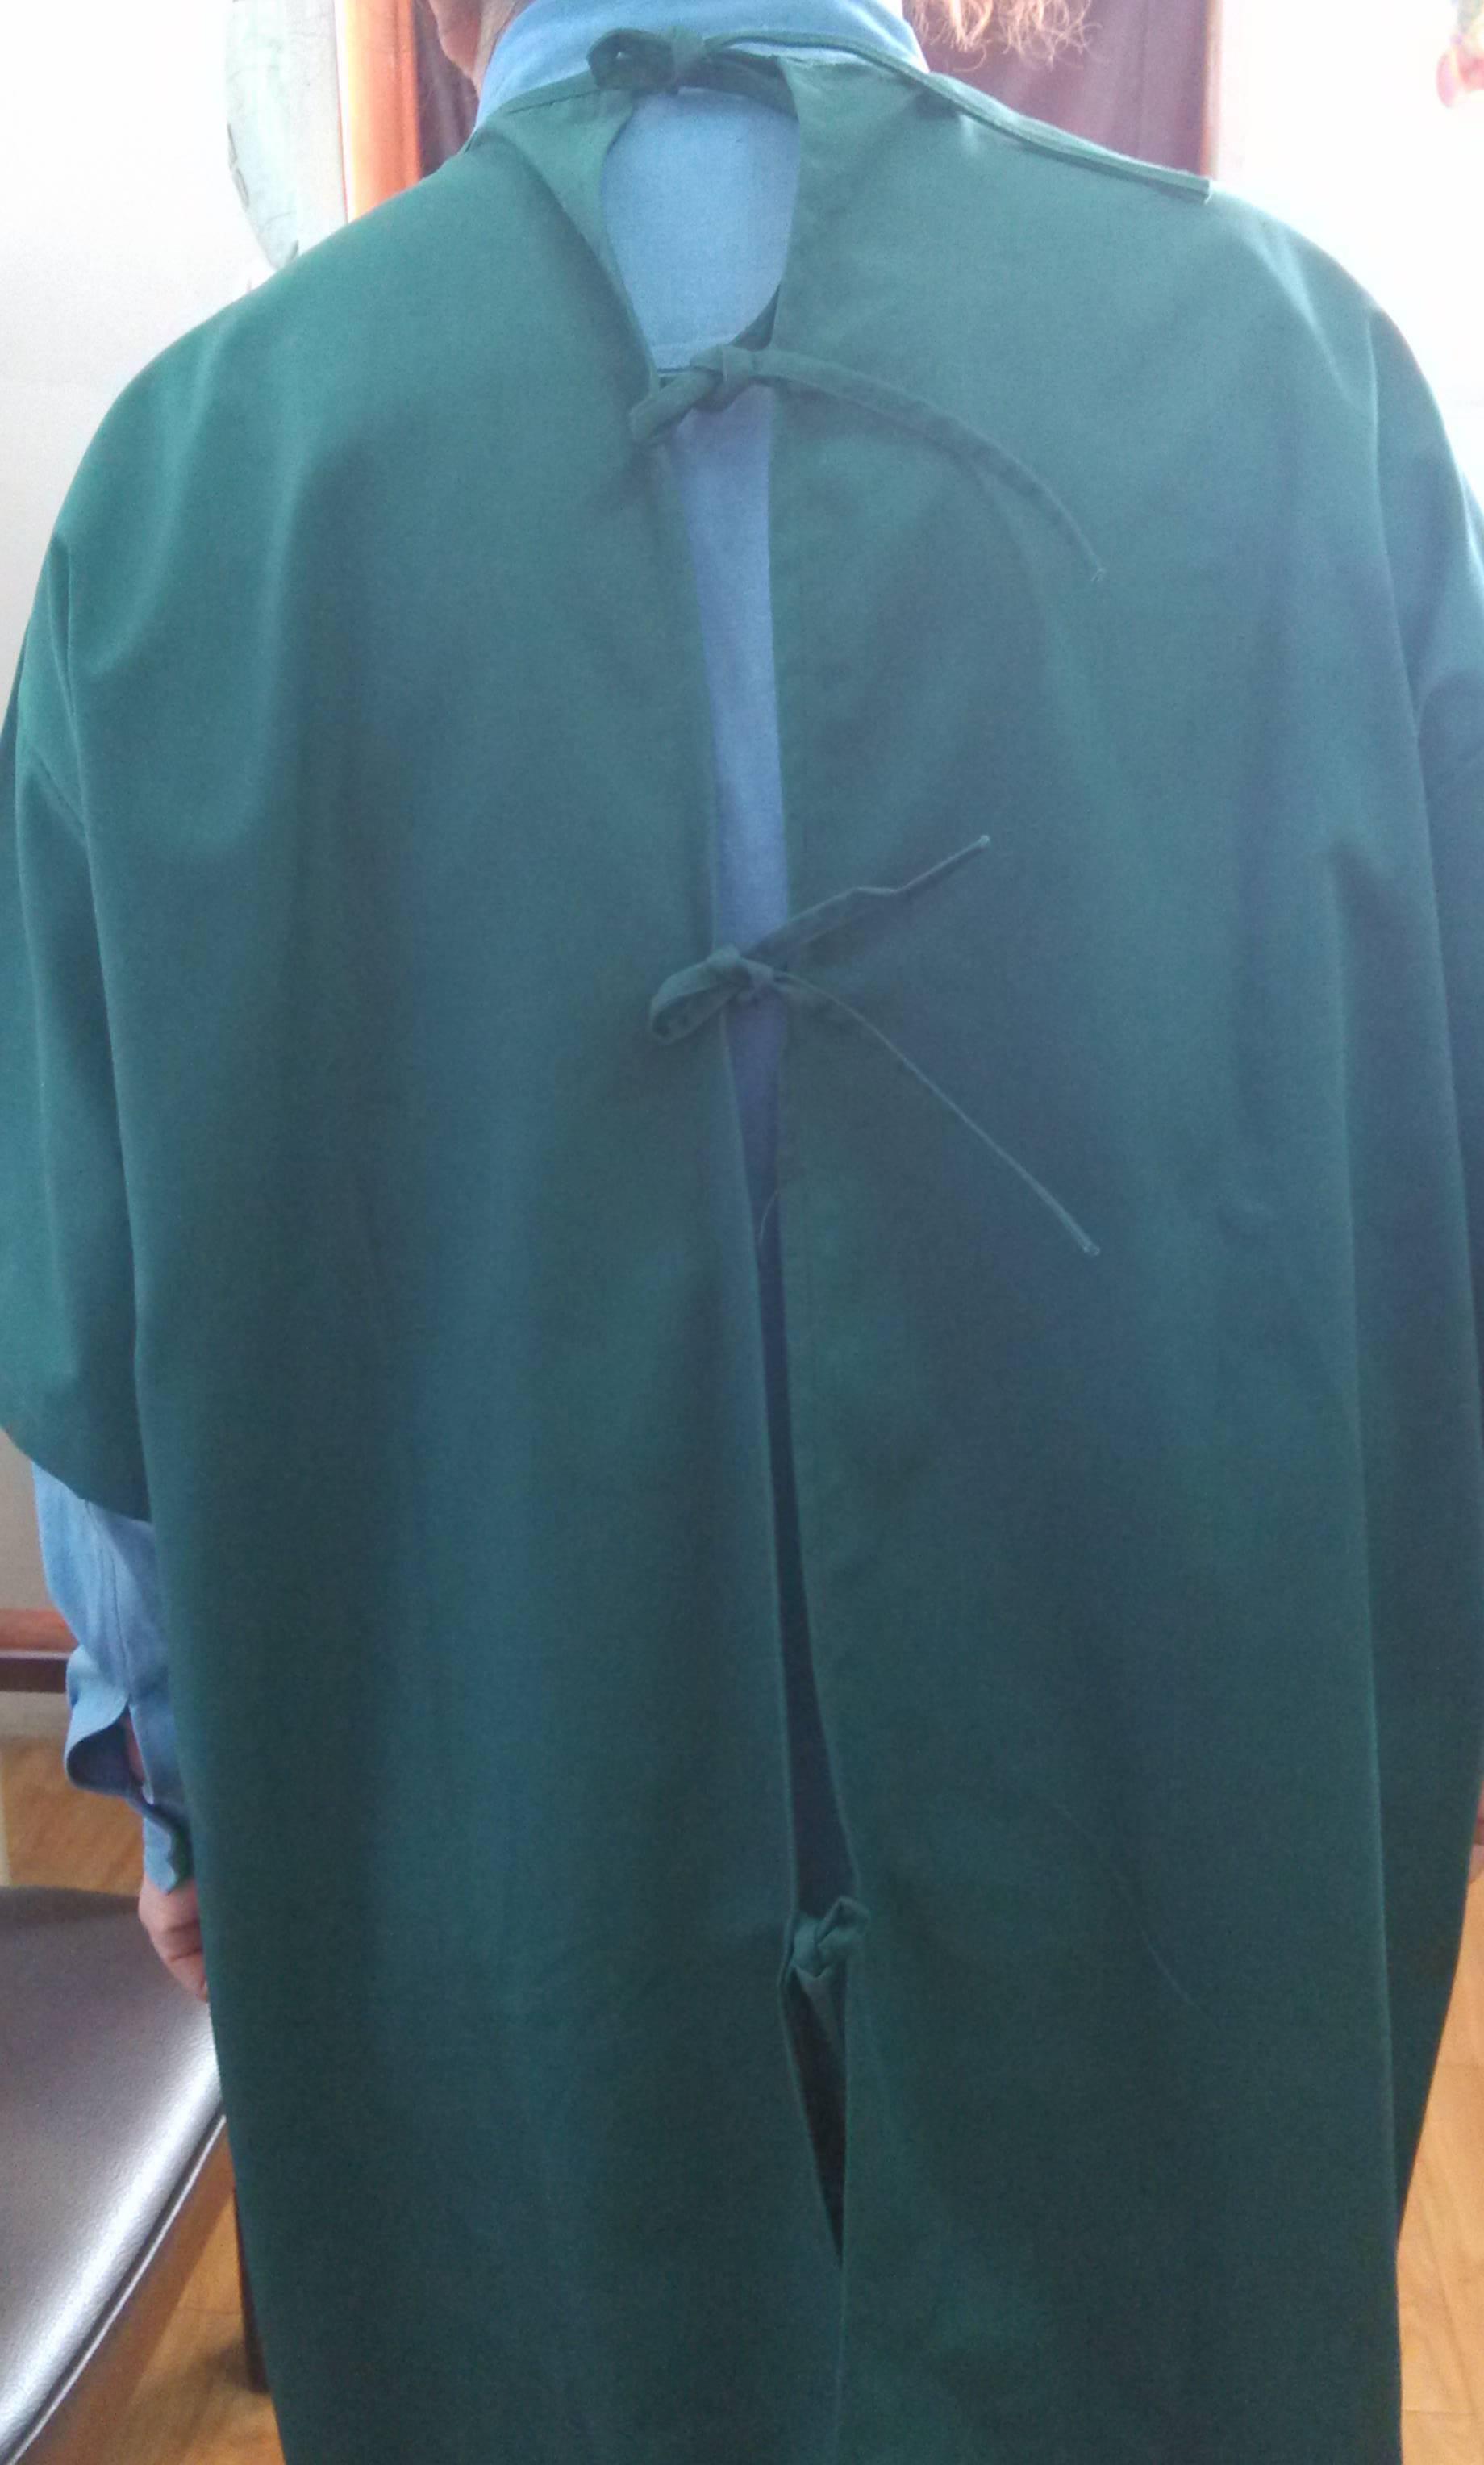 Nurse uniform dress/ Medical dress/ Hospital robe